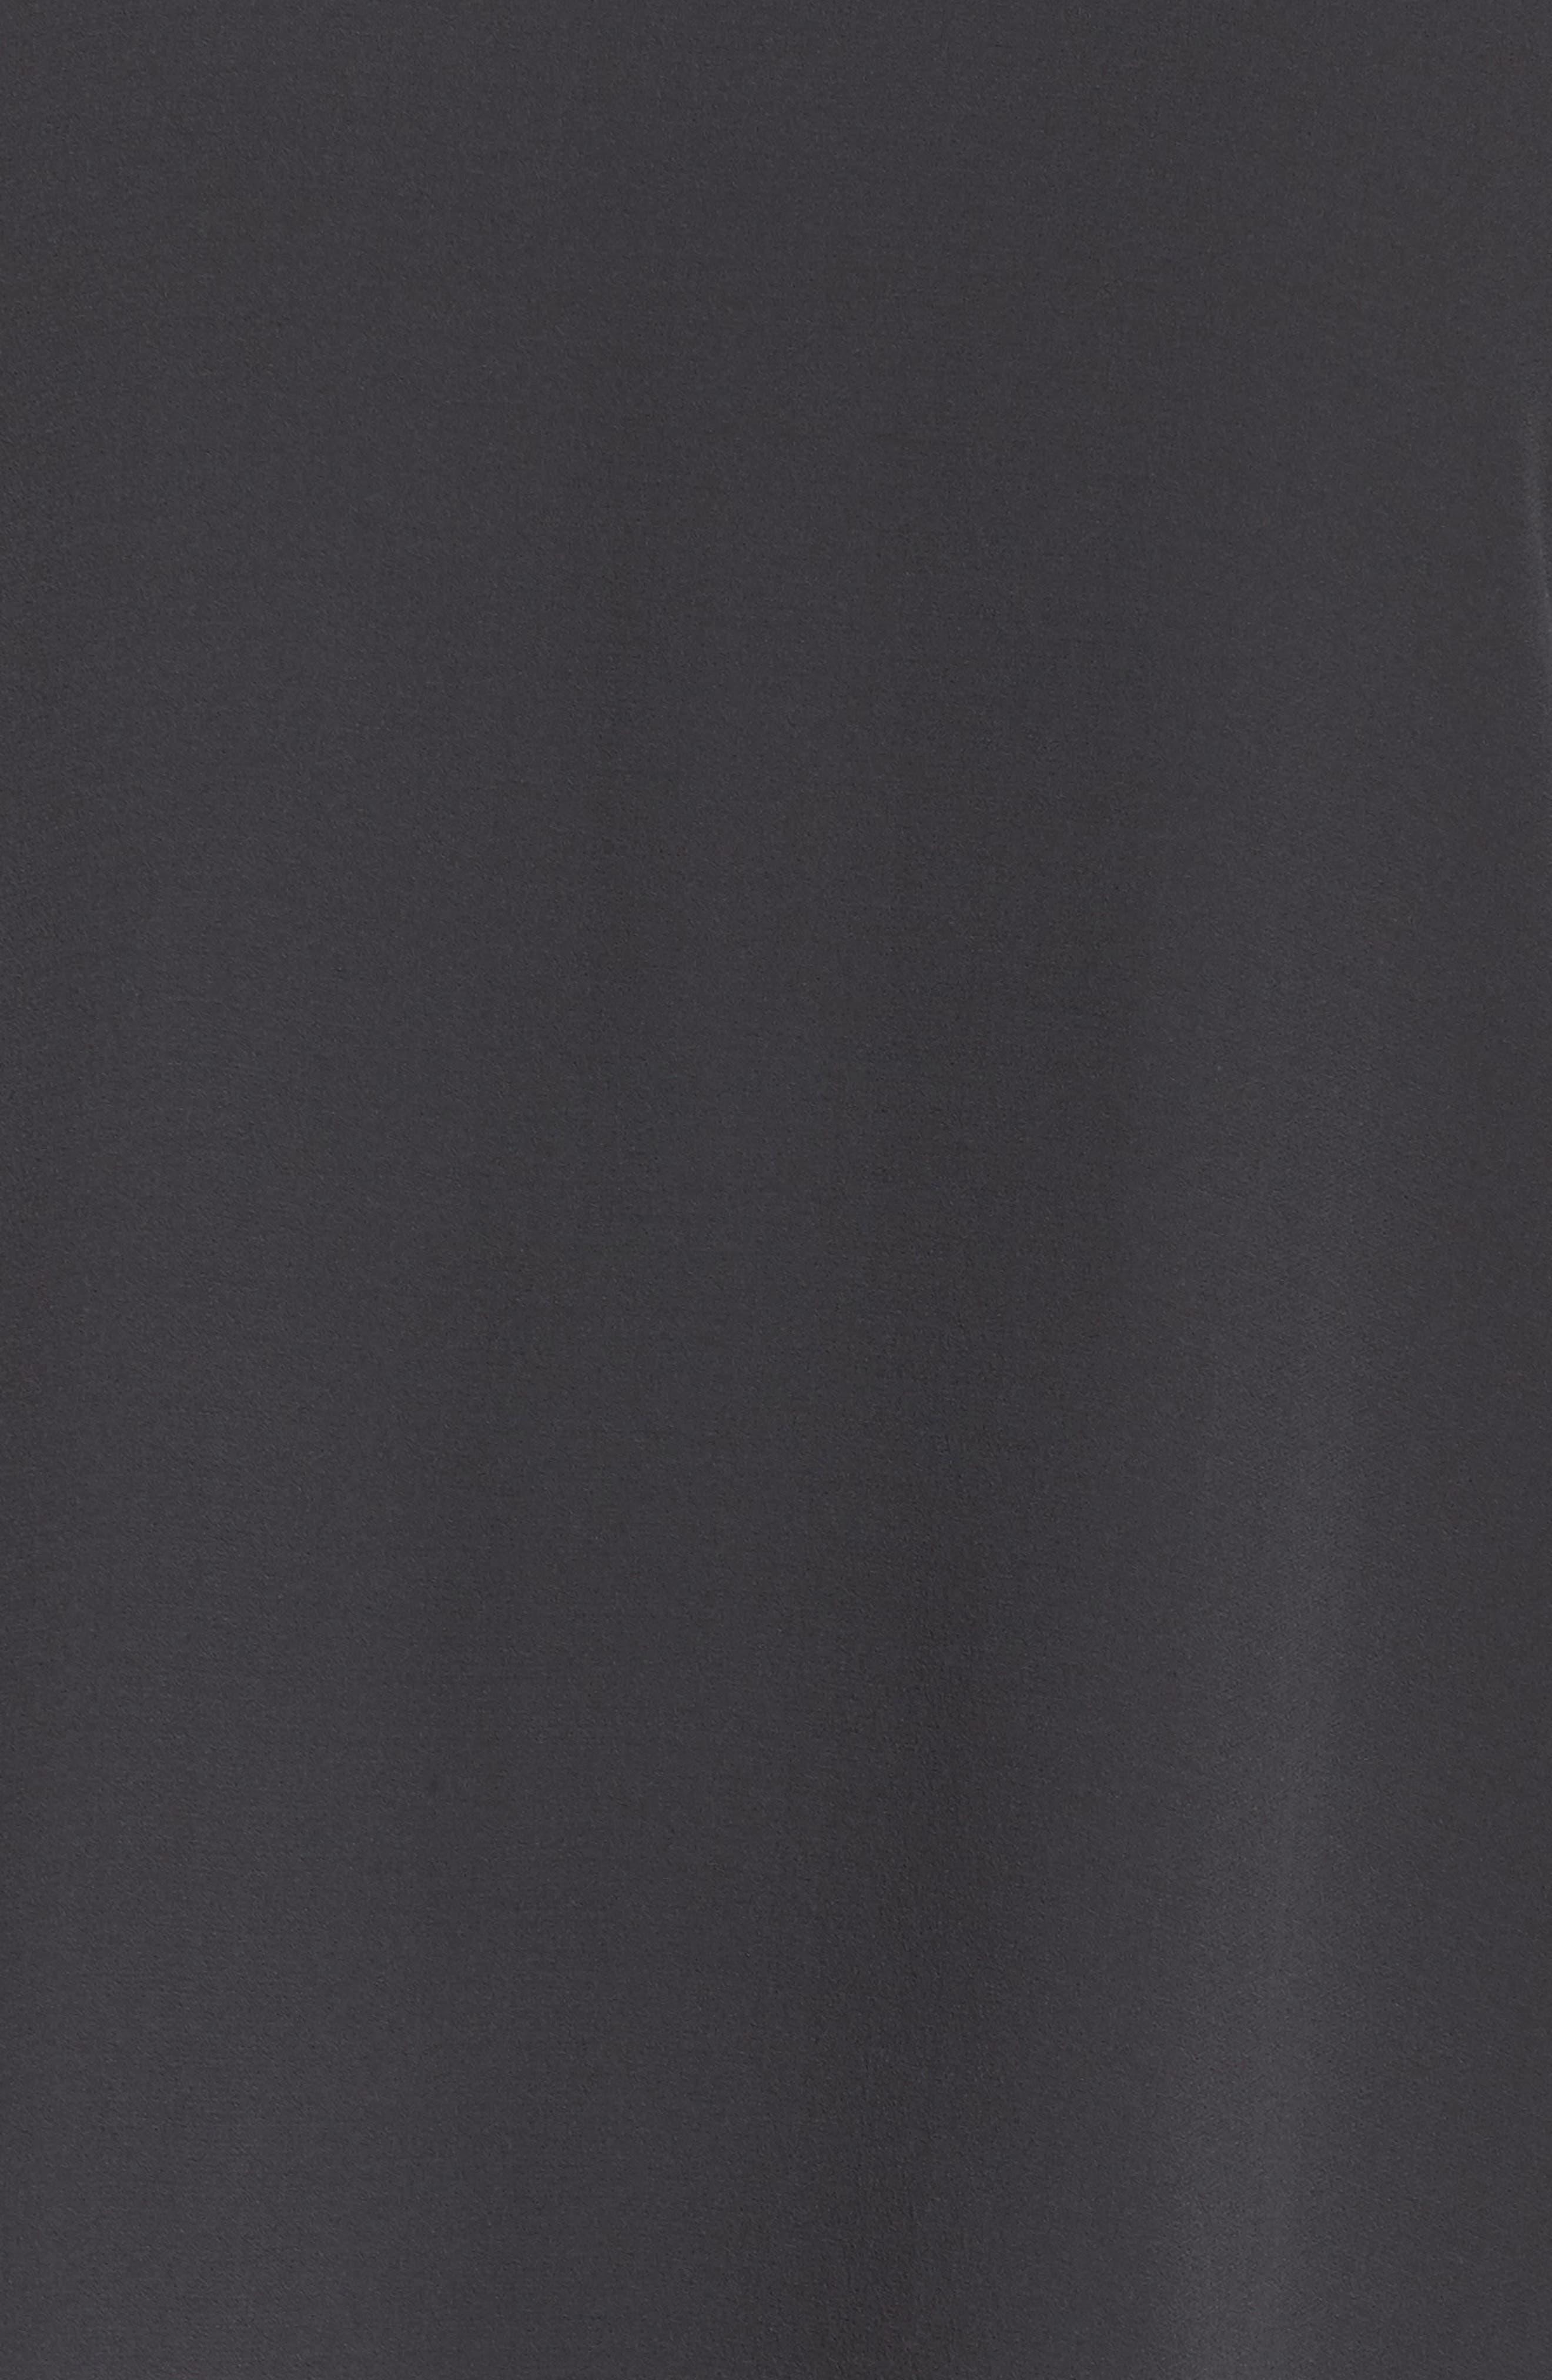 Ruffled Sleeve Silk Top,                             Alternate thumbnail 6, color,                             025